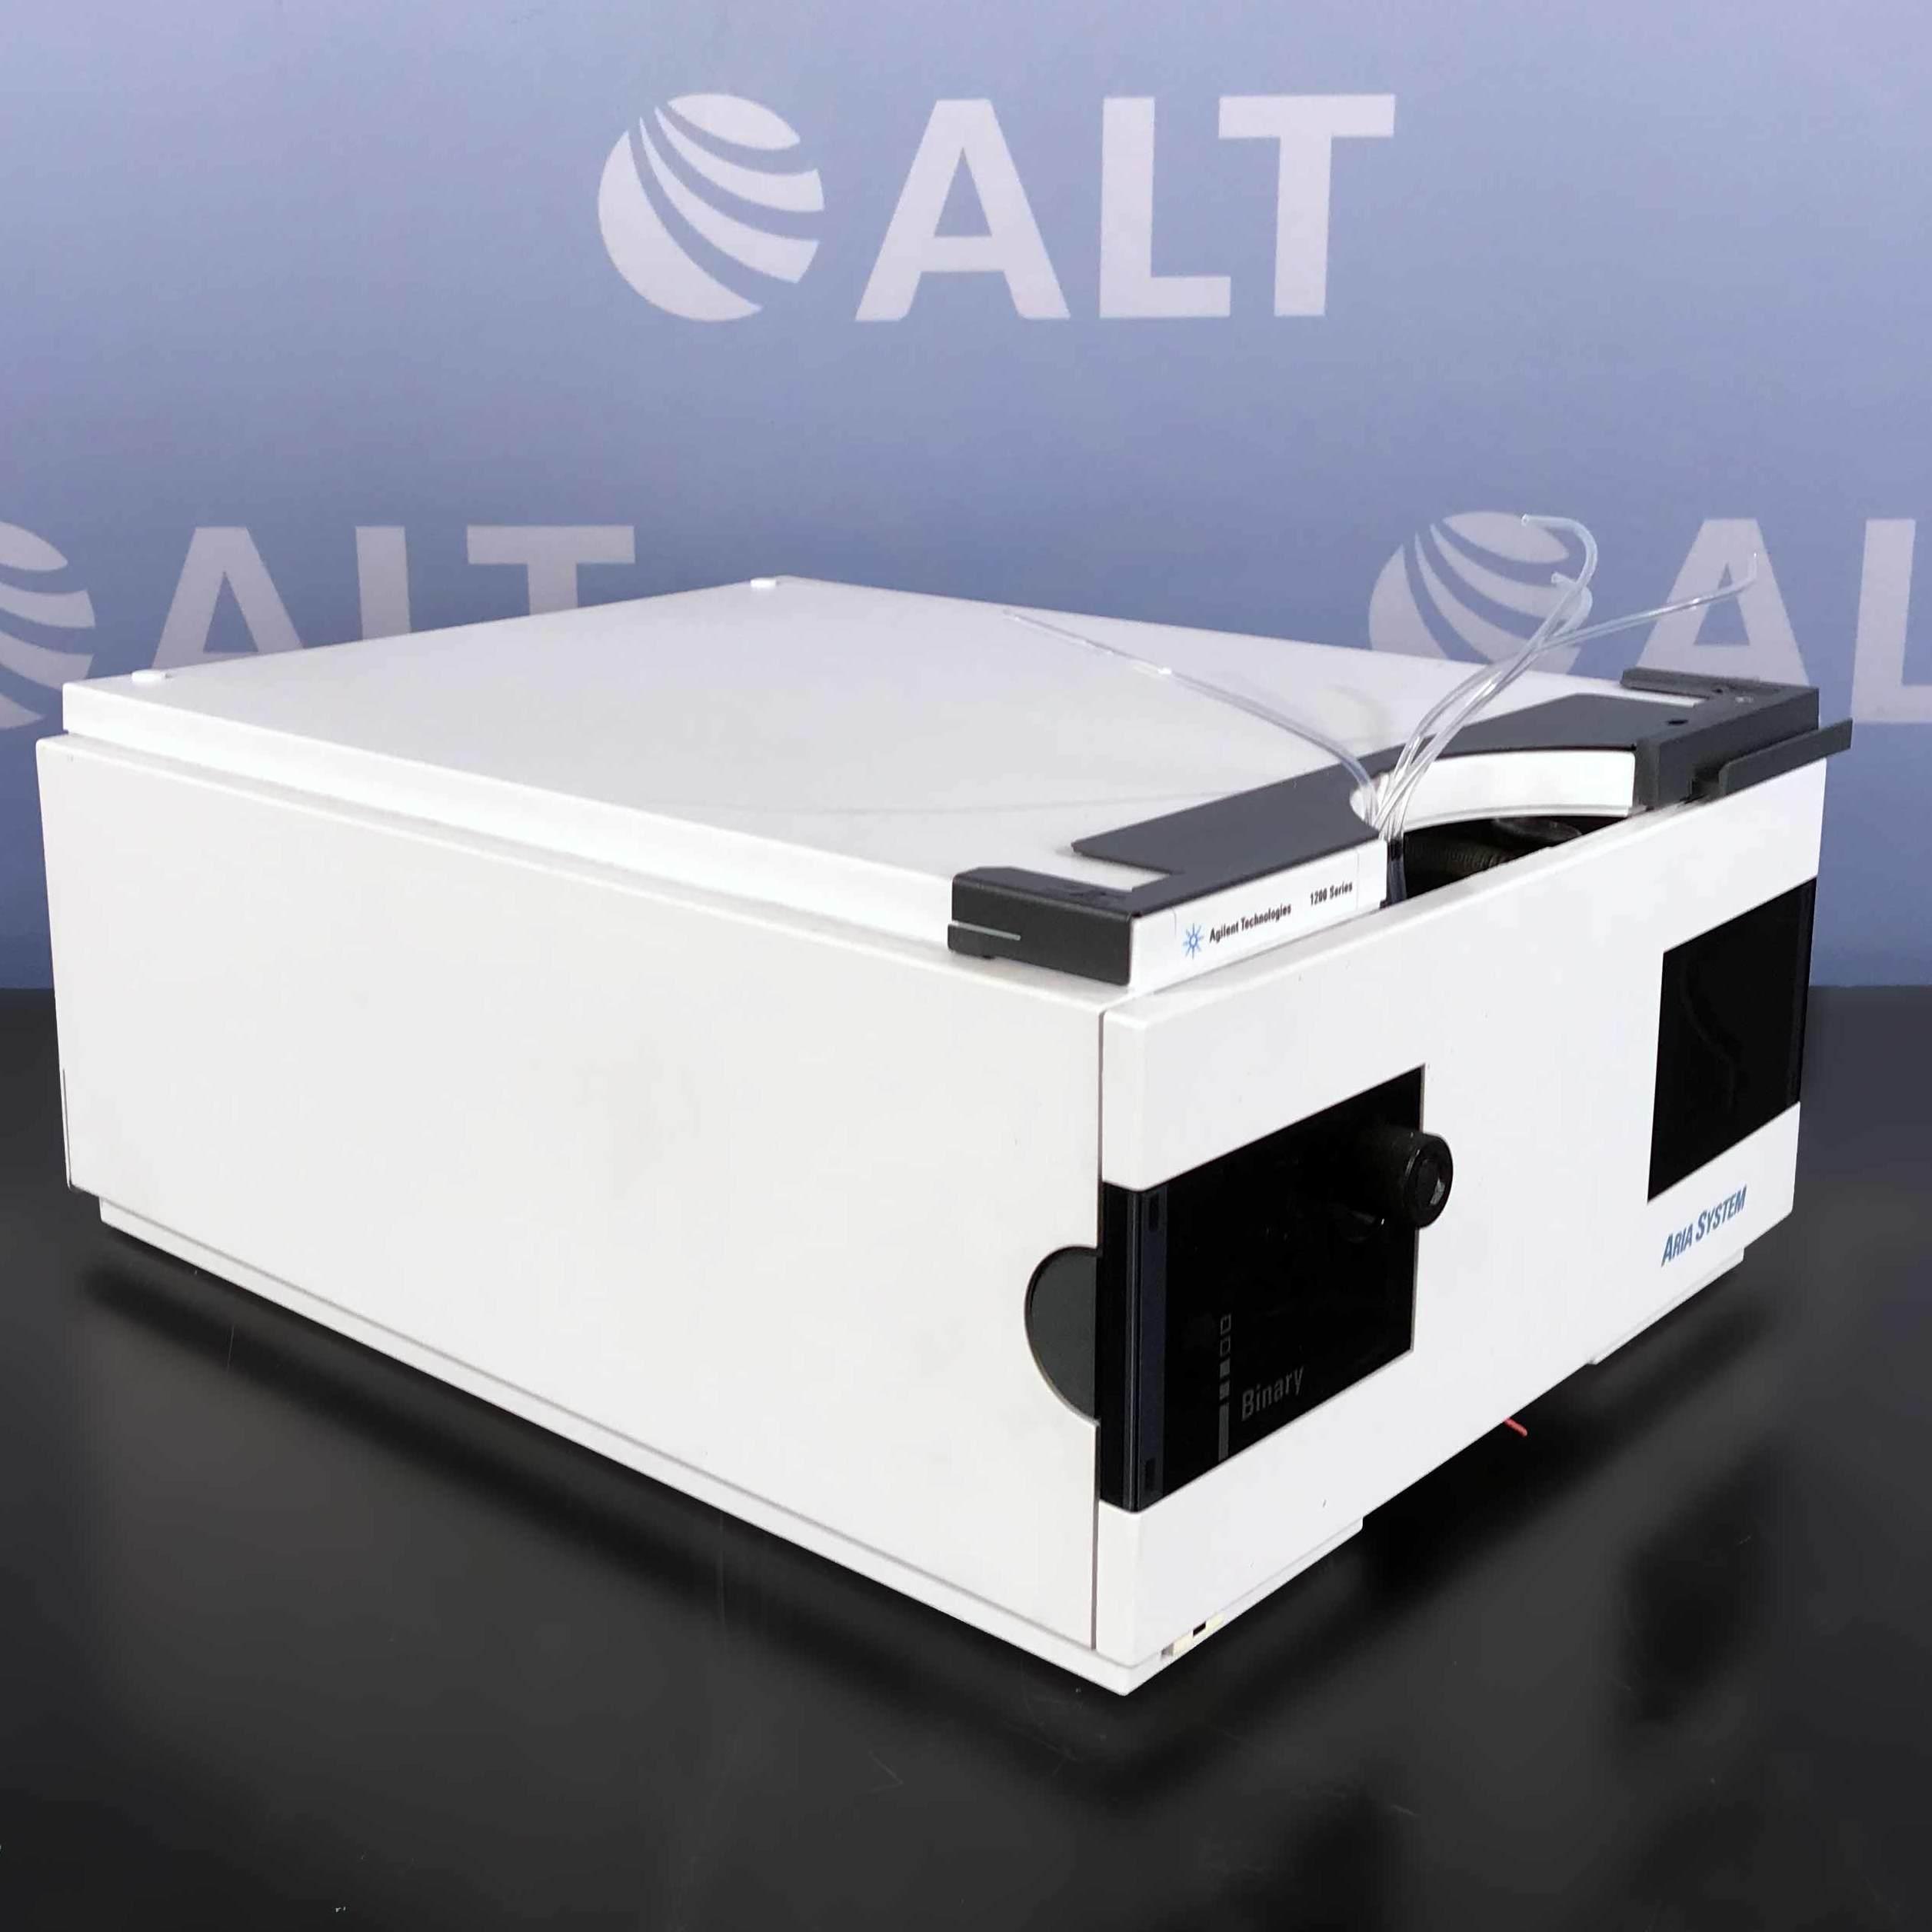 Agilent Technologies 1200 Series G1312A Binary Pump Image